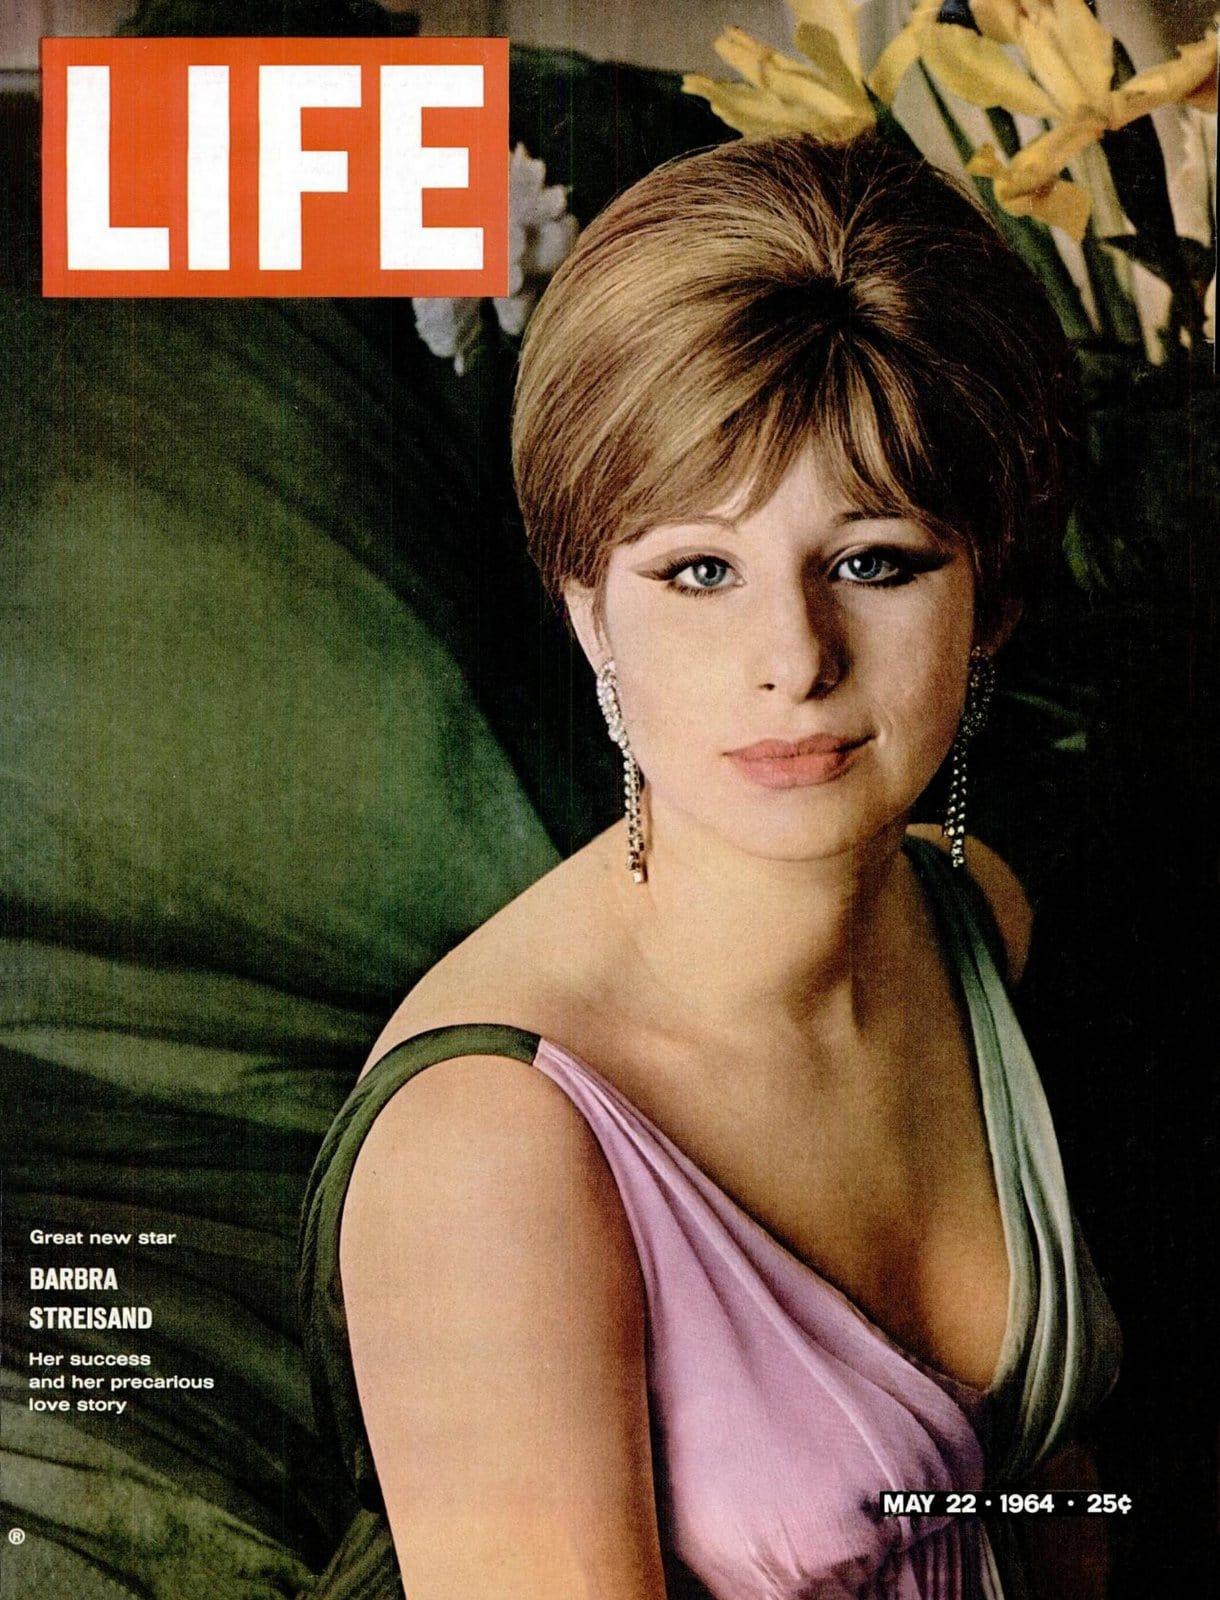 Barbra Streisand at 21 A born loser's success and precarious love (1964)